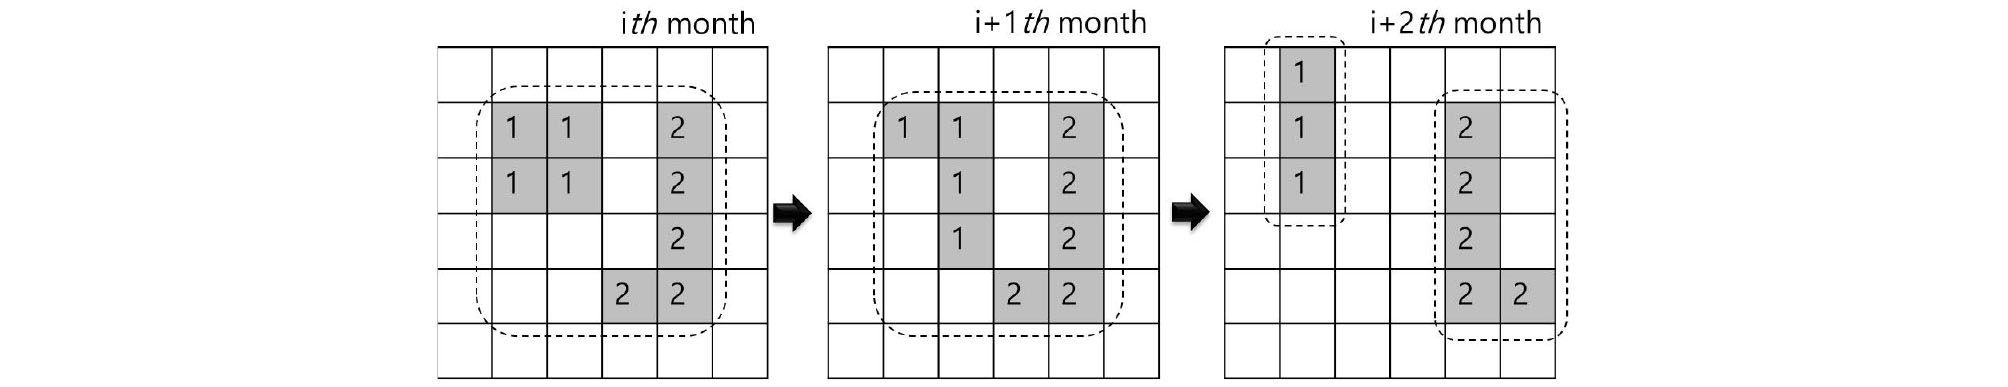 http://static.apub.kr/journalsite/sites/ksce/2020-040-01/N0110400103/images/Figure_KSCE_40_01_03_F1.jpg